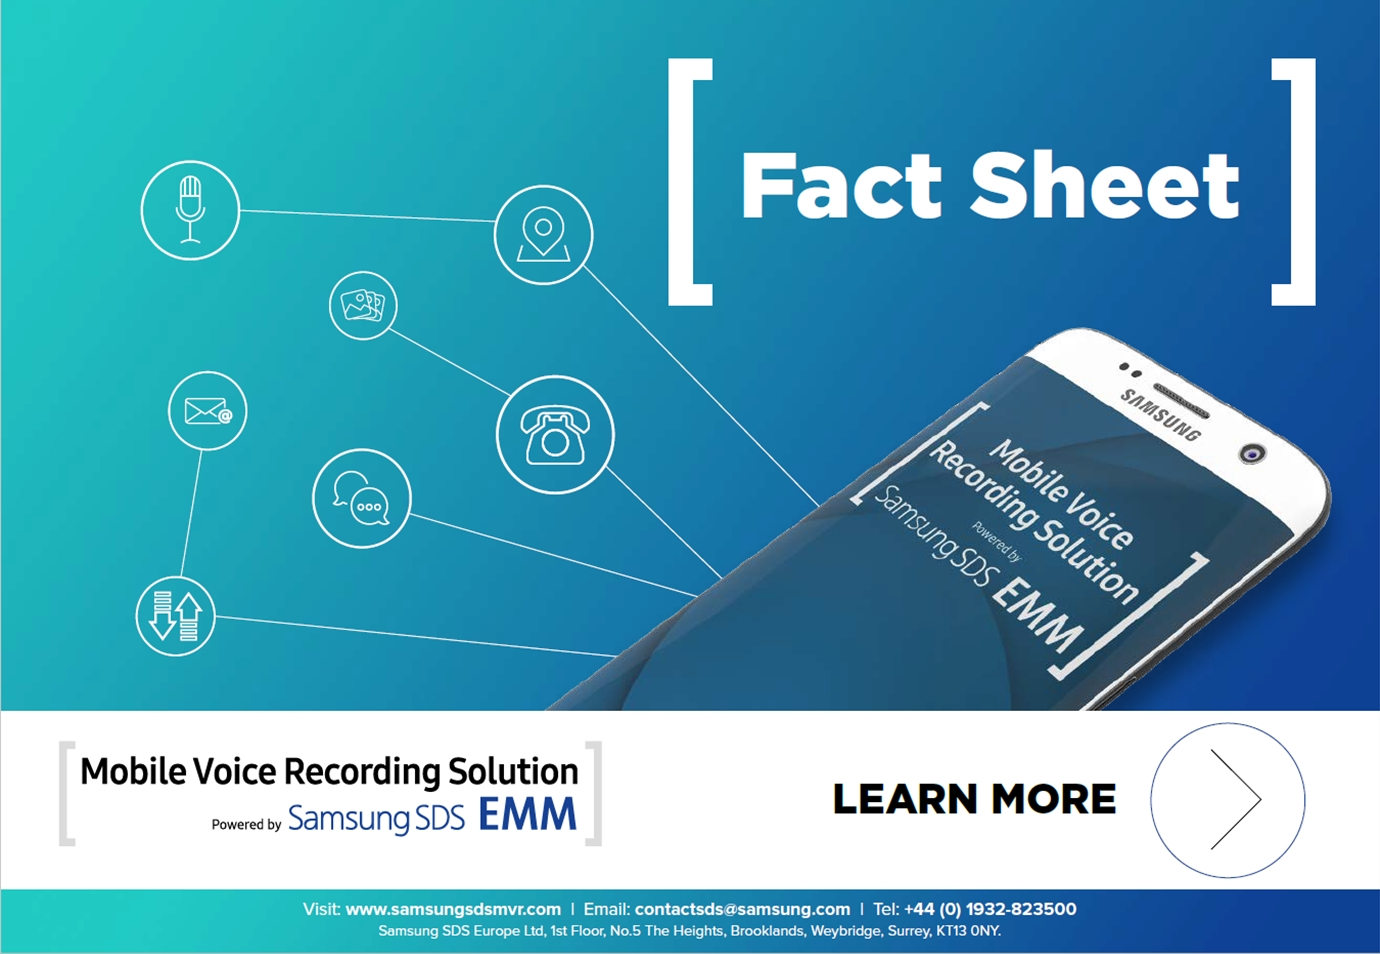 Mobile Voice Recording Solution – Explained!